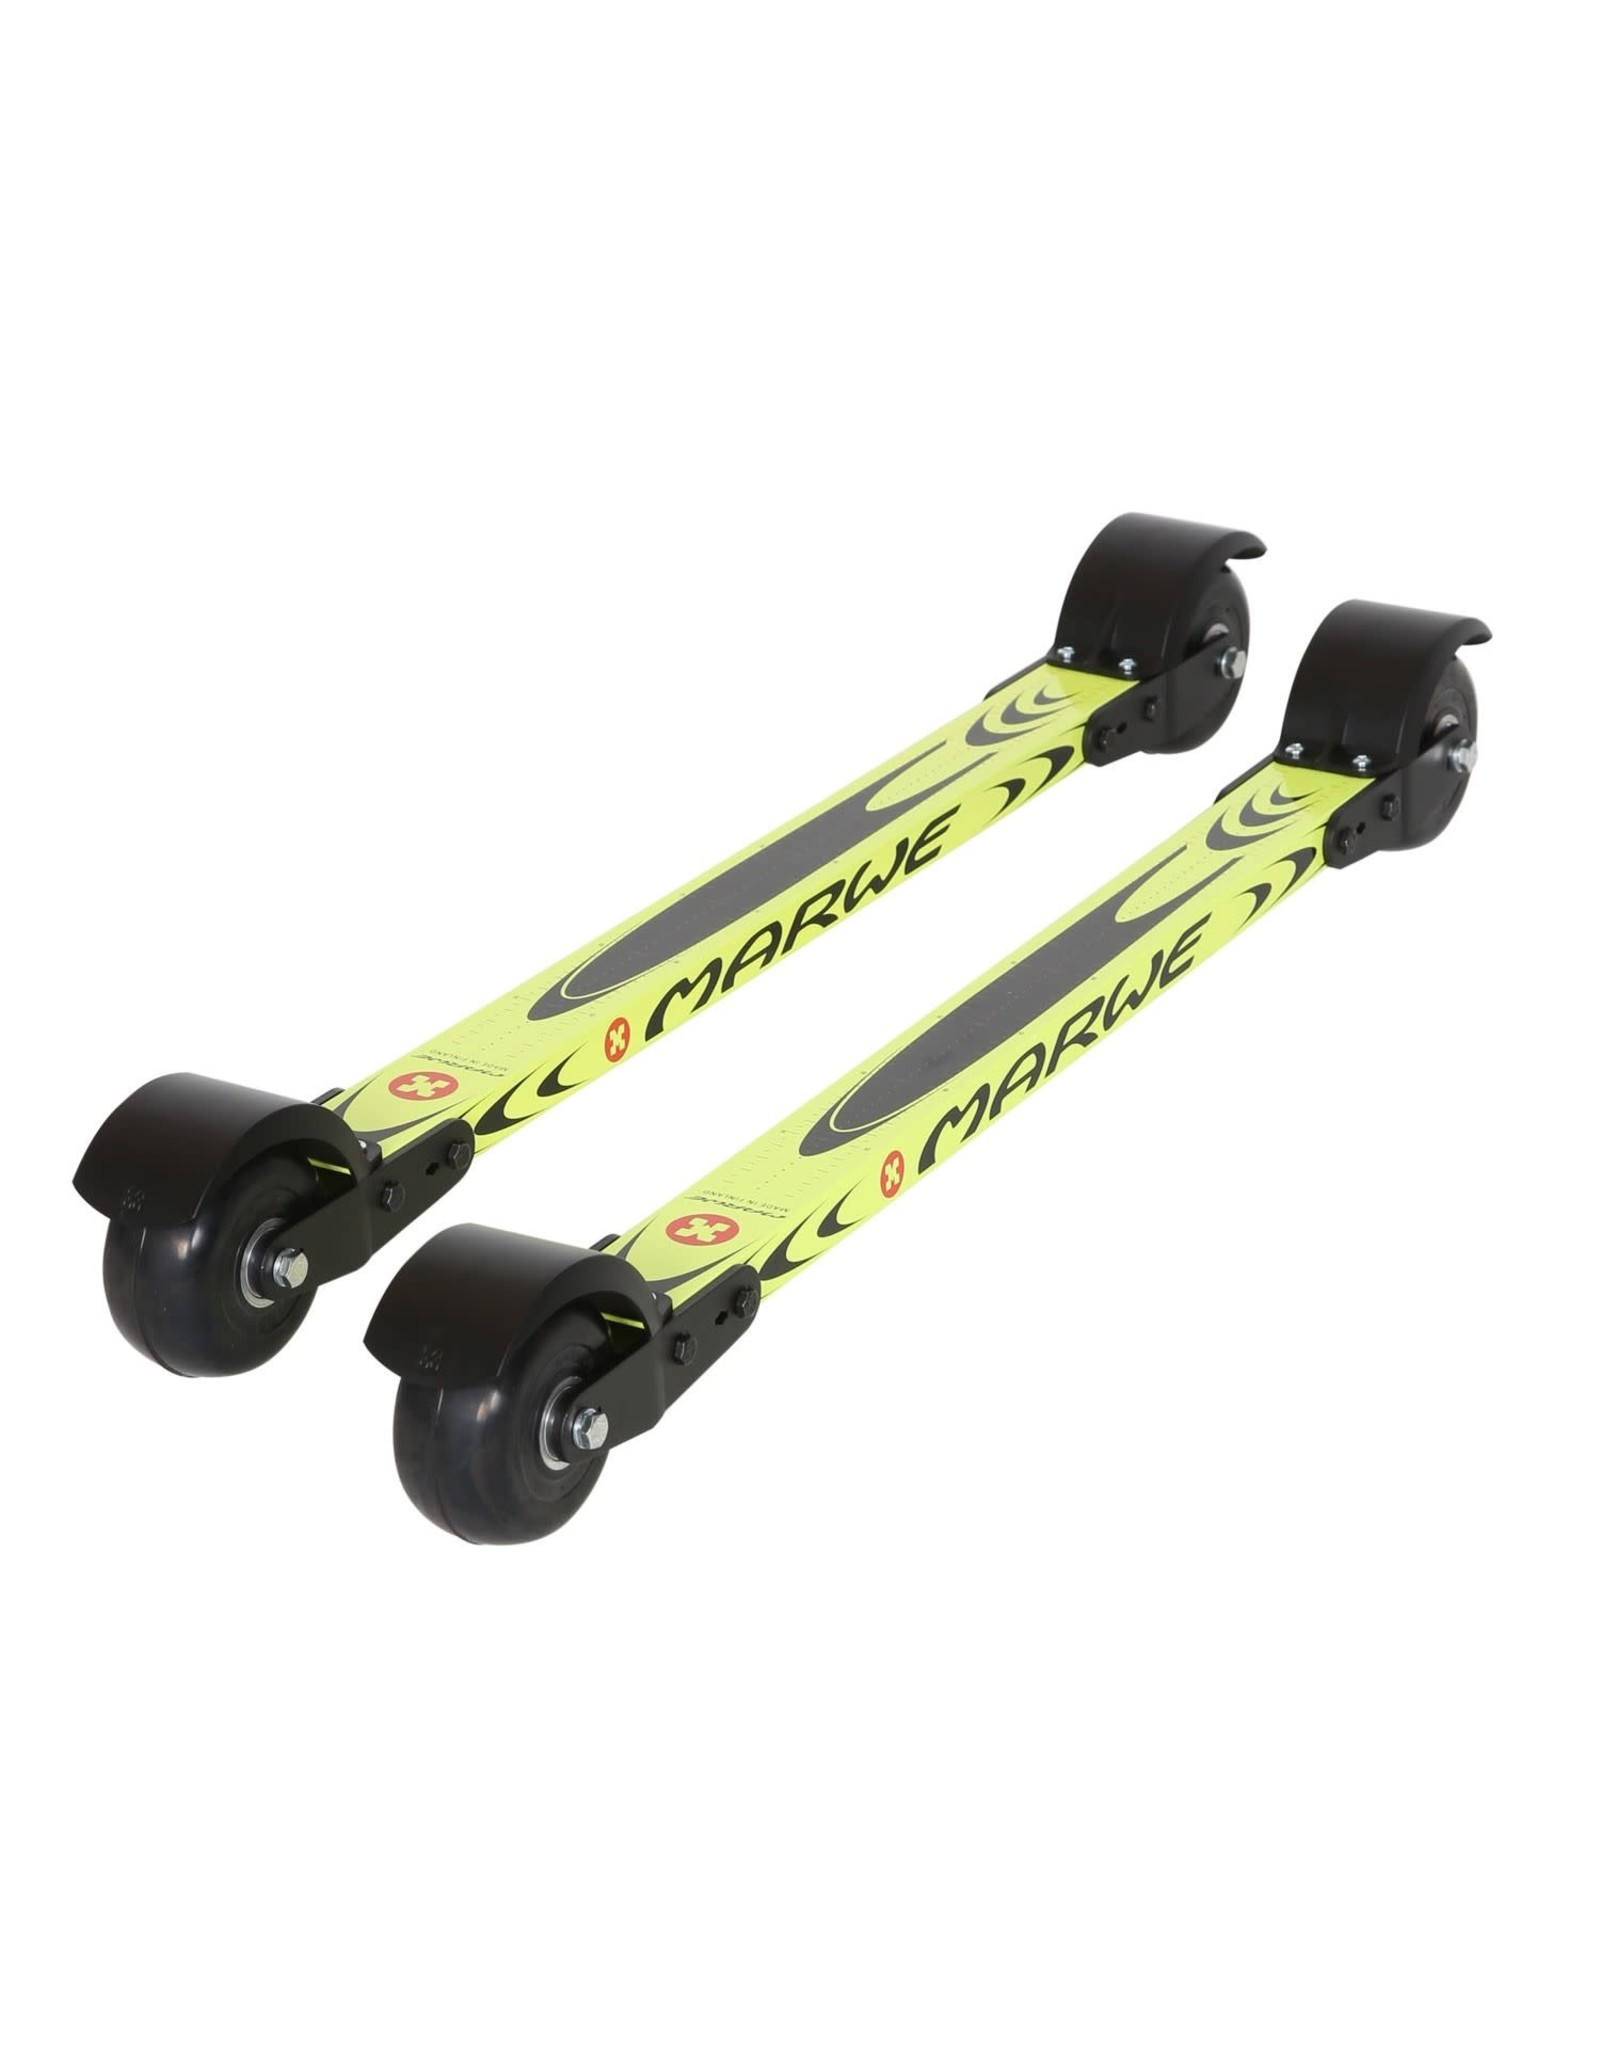 Marwe Marwe 590A Skate Rollerski